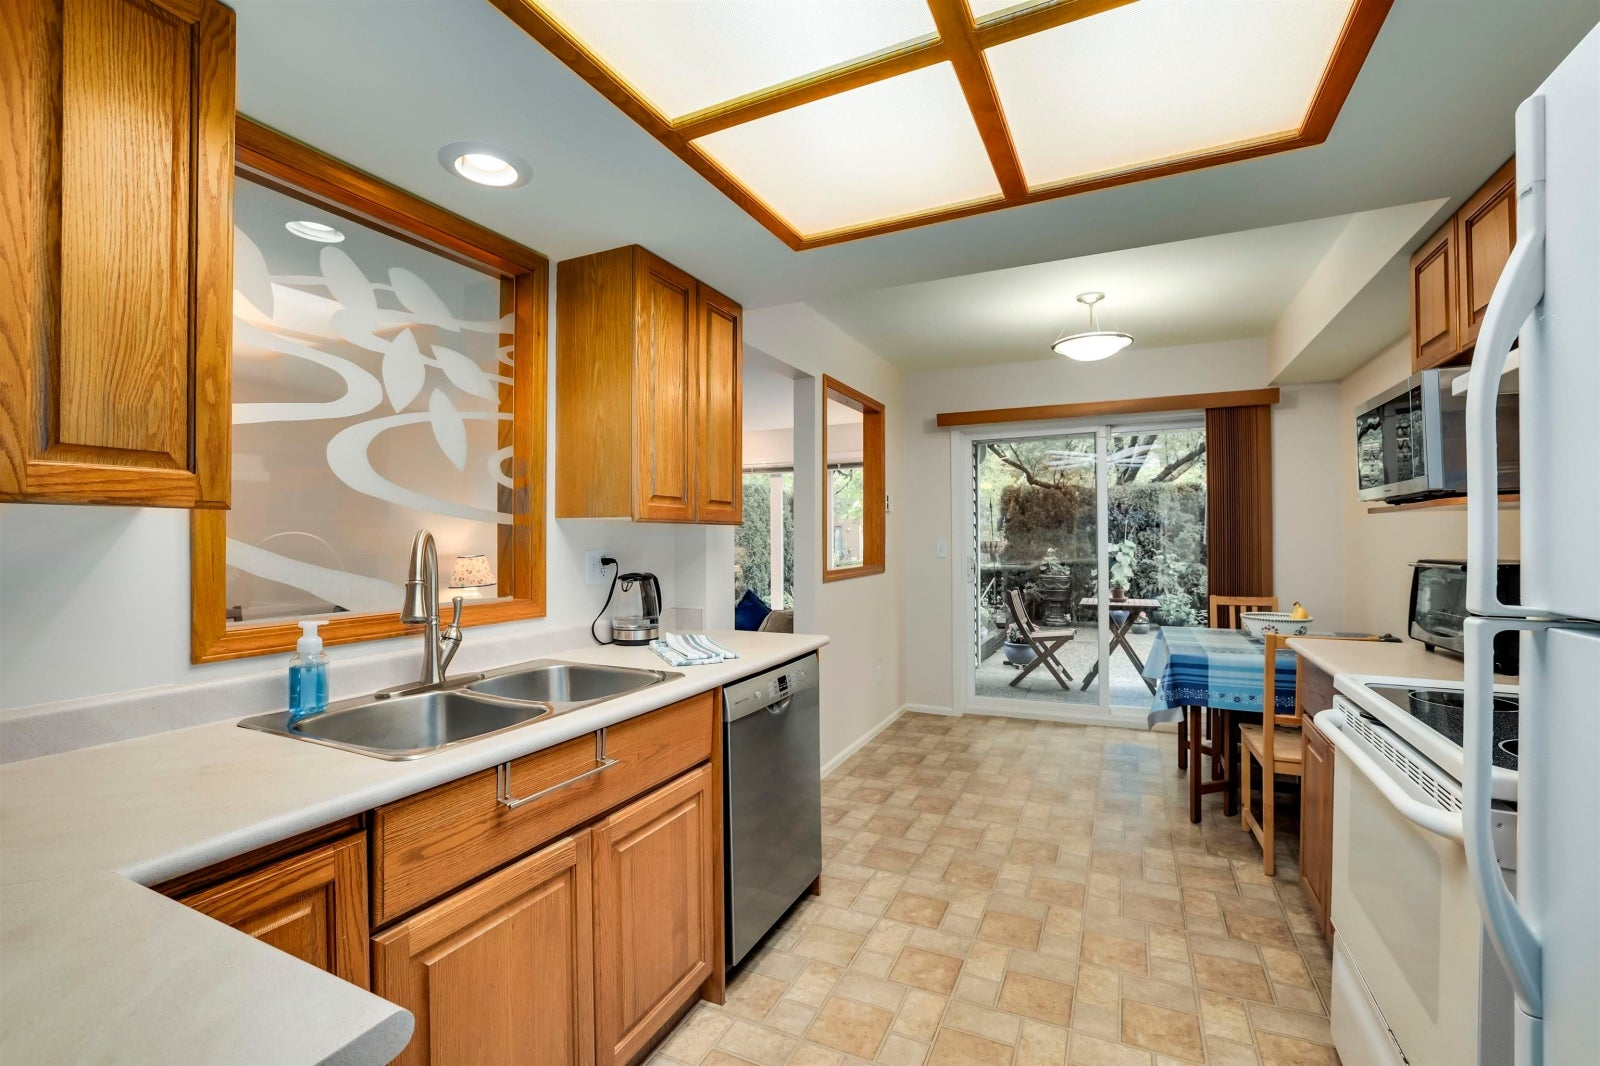 103 1132 DUFFERIN STREET - Eagle Ridge CQ Apartment/Condo for sale, 2 Bedrooms (R2618654) #10